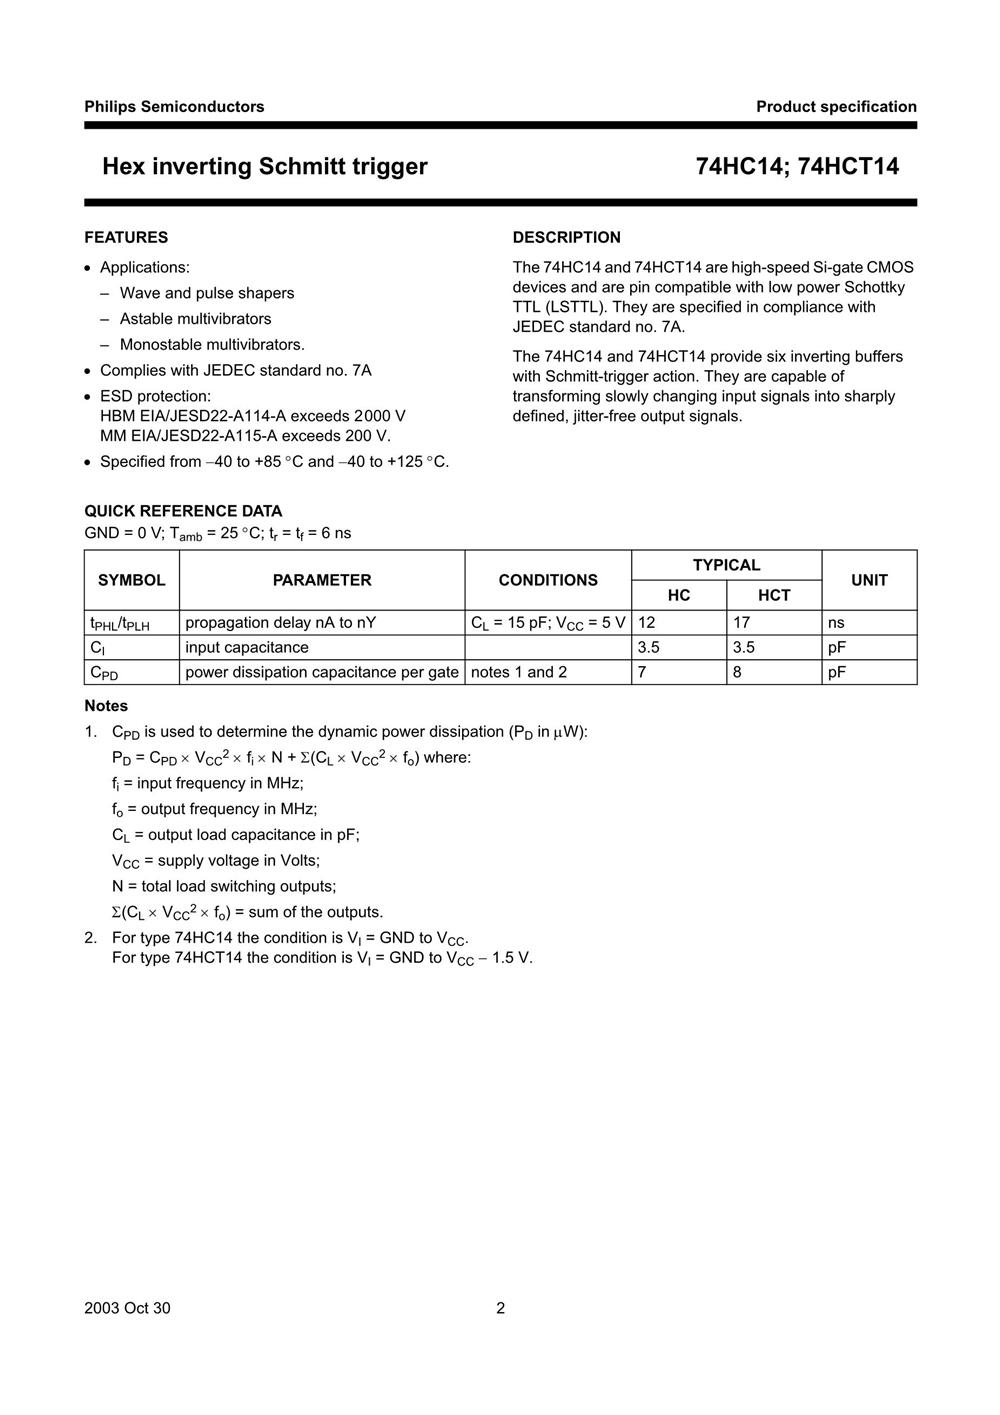 20pcs 74hc04 Hex Inverter CMOS HIGH SPEED SOIC 14